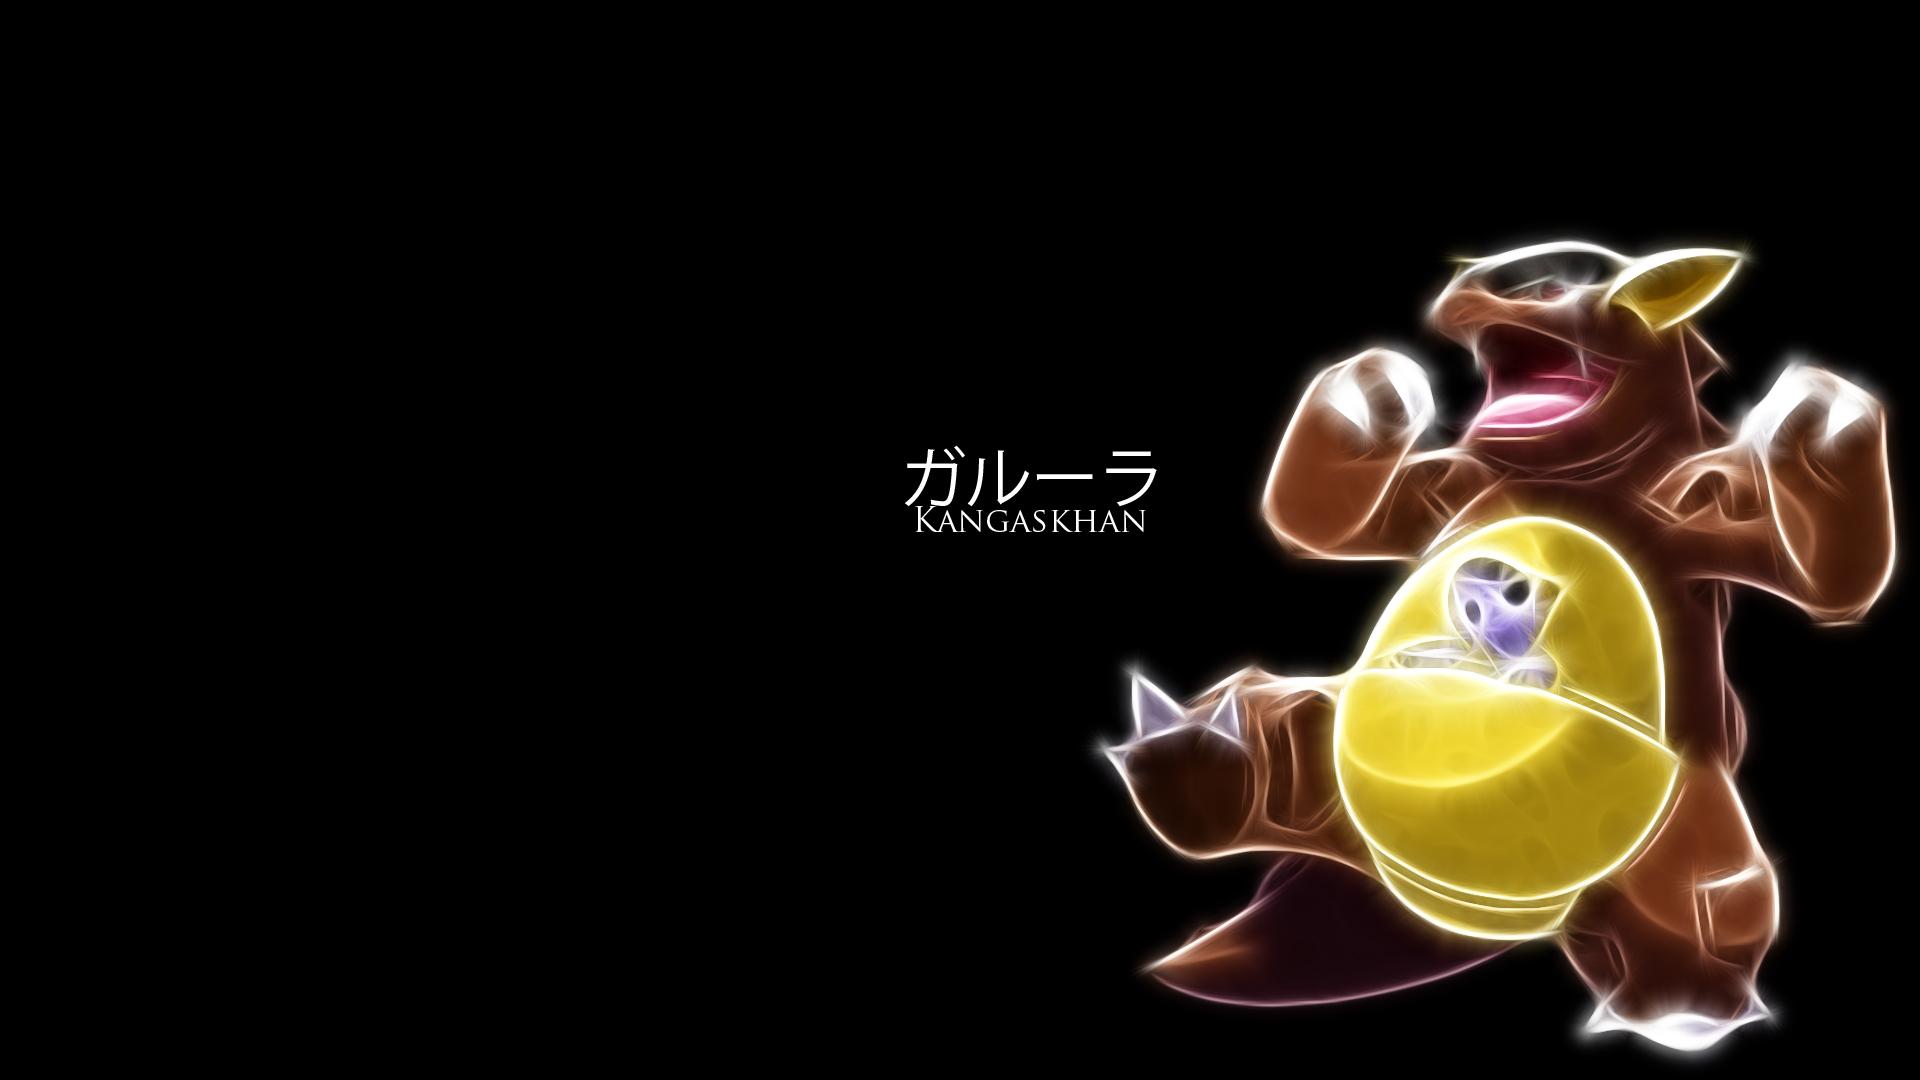 Pokemon Kangaskhan Girl Images